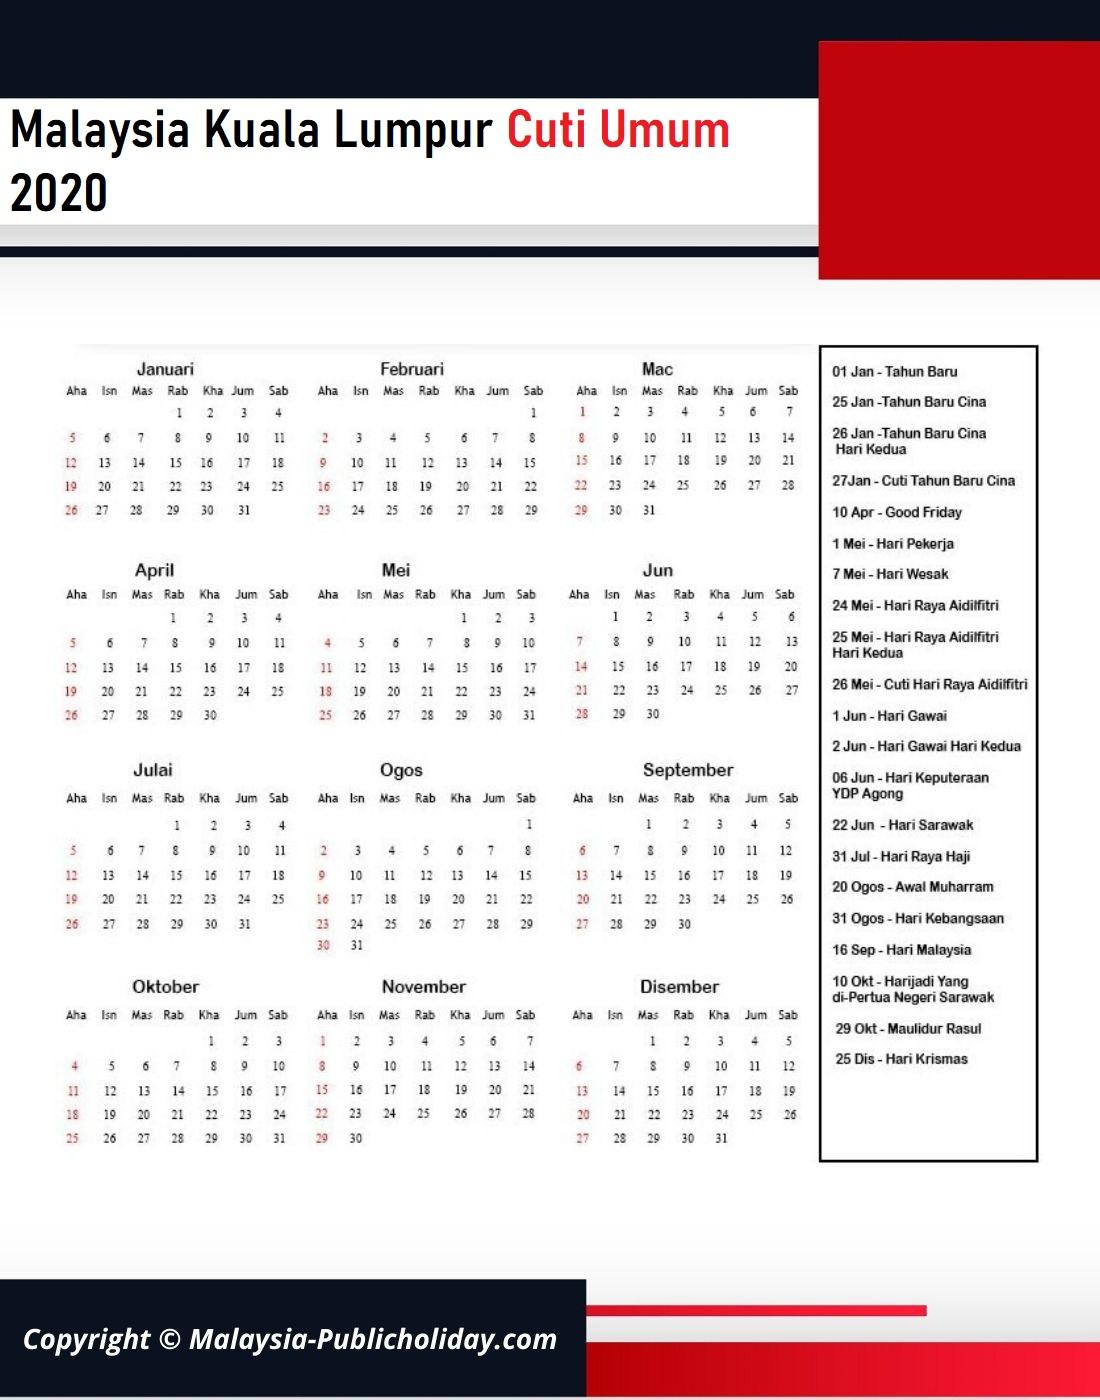 Cuti Umum Kuala Lumpur 2020 Malaysia